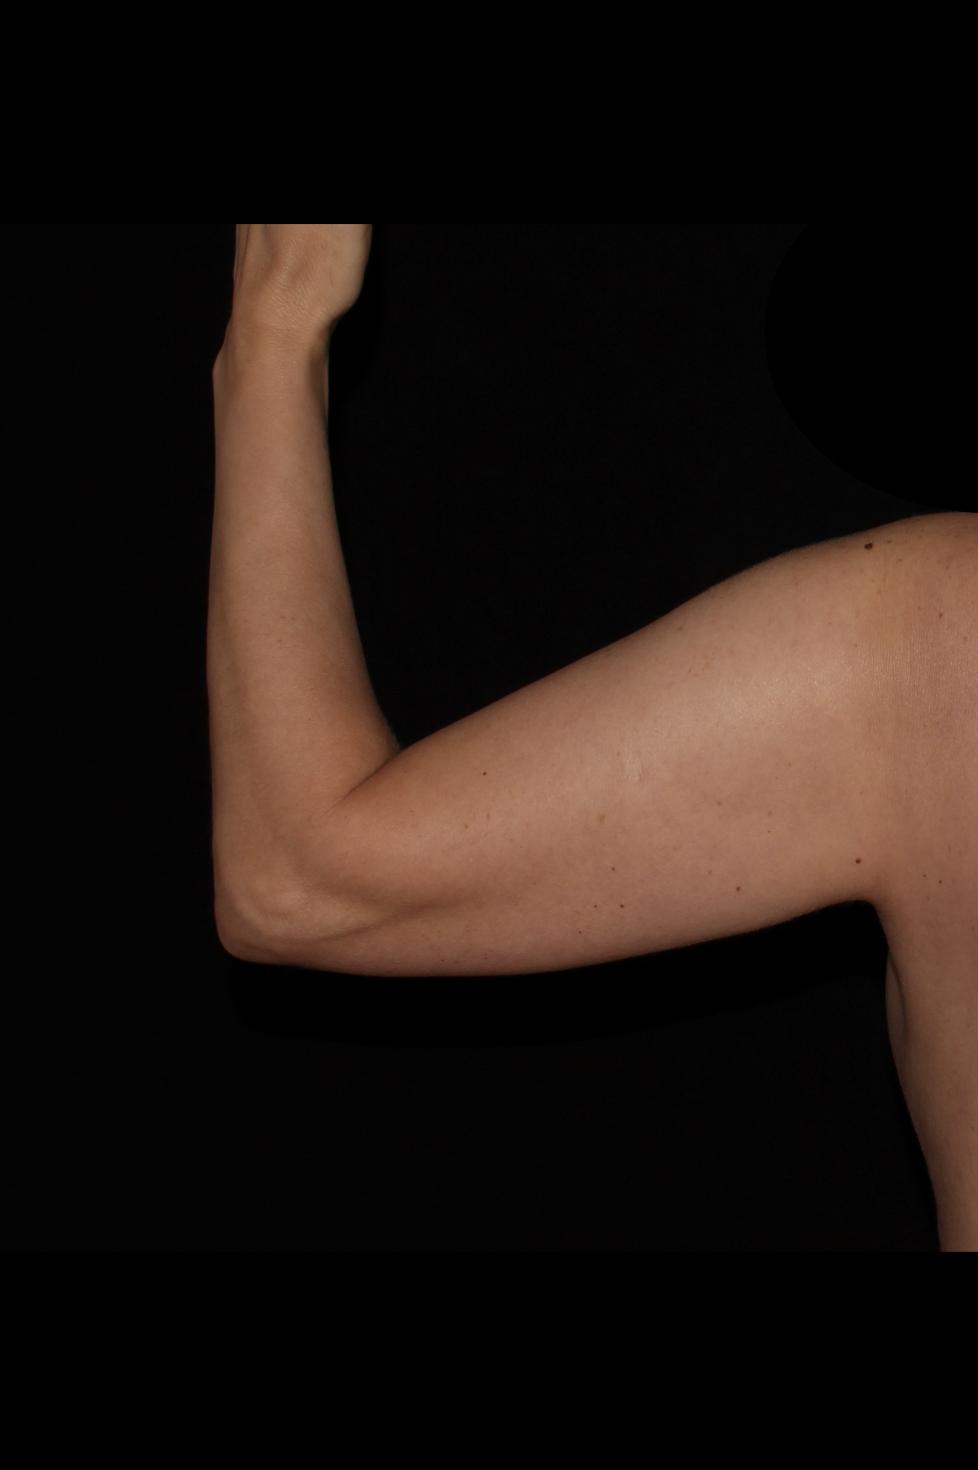 Before Arm Procedure - Arm Liposuction & Magic Tight®